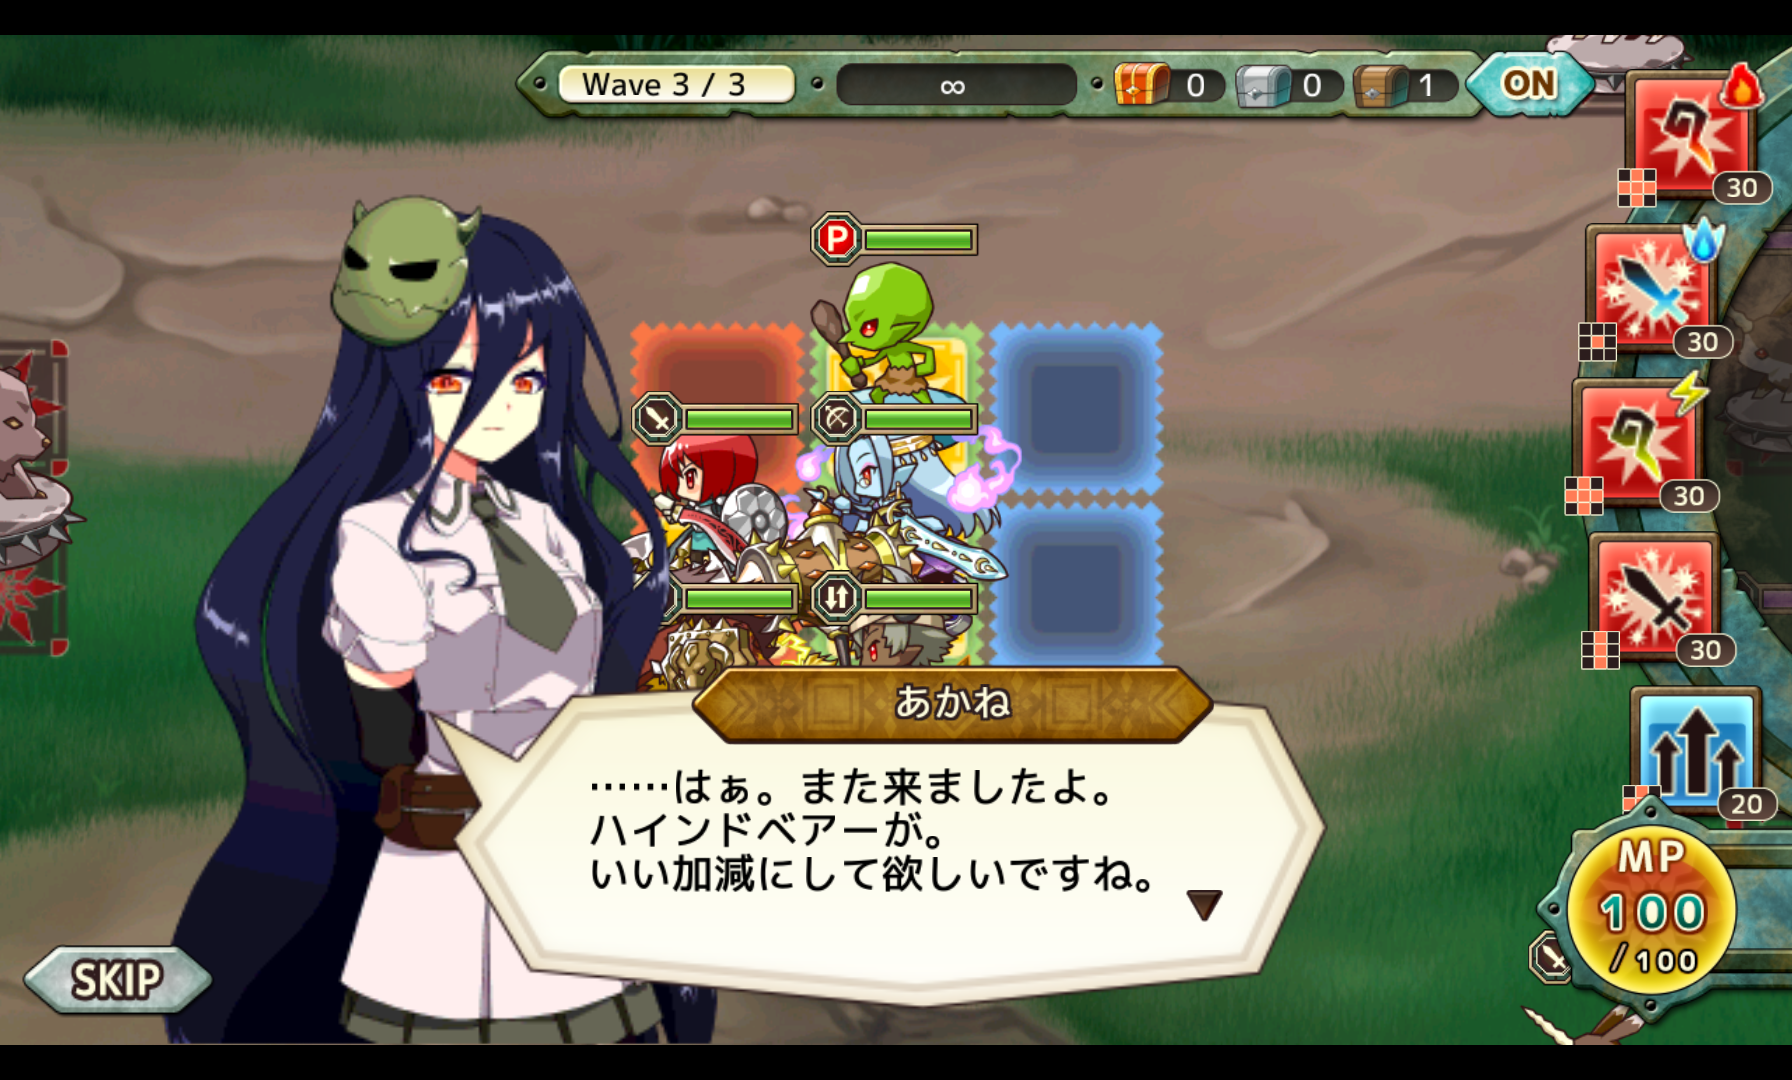 androidアプリ Re:Monster(リ・モンスター)〜ゴブリン転生記〜攻略スクリーンショット1